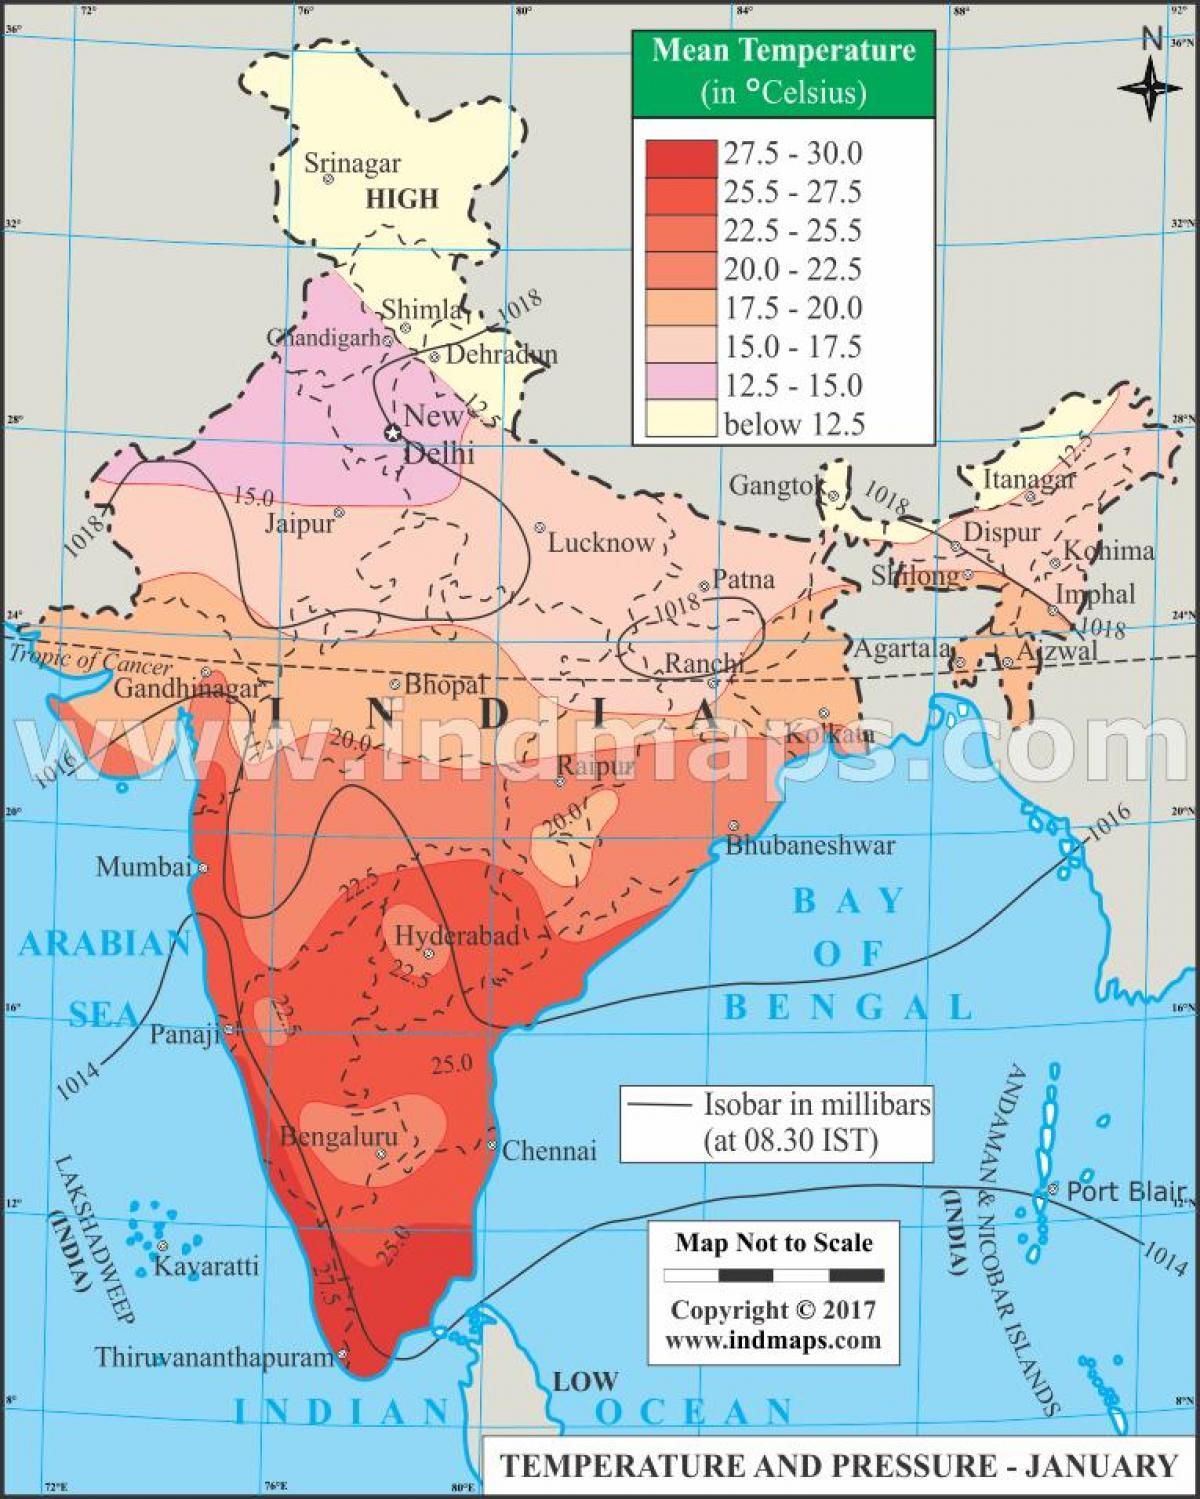 India Temperature Map India temperature map   Temperature map India (Southern Asia   Asia)